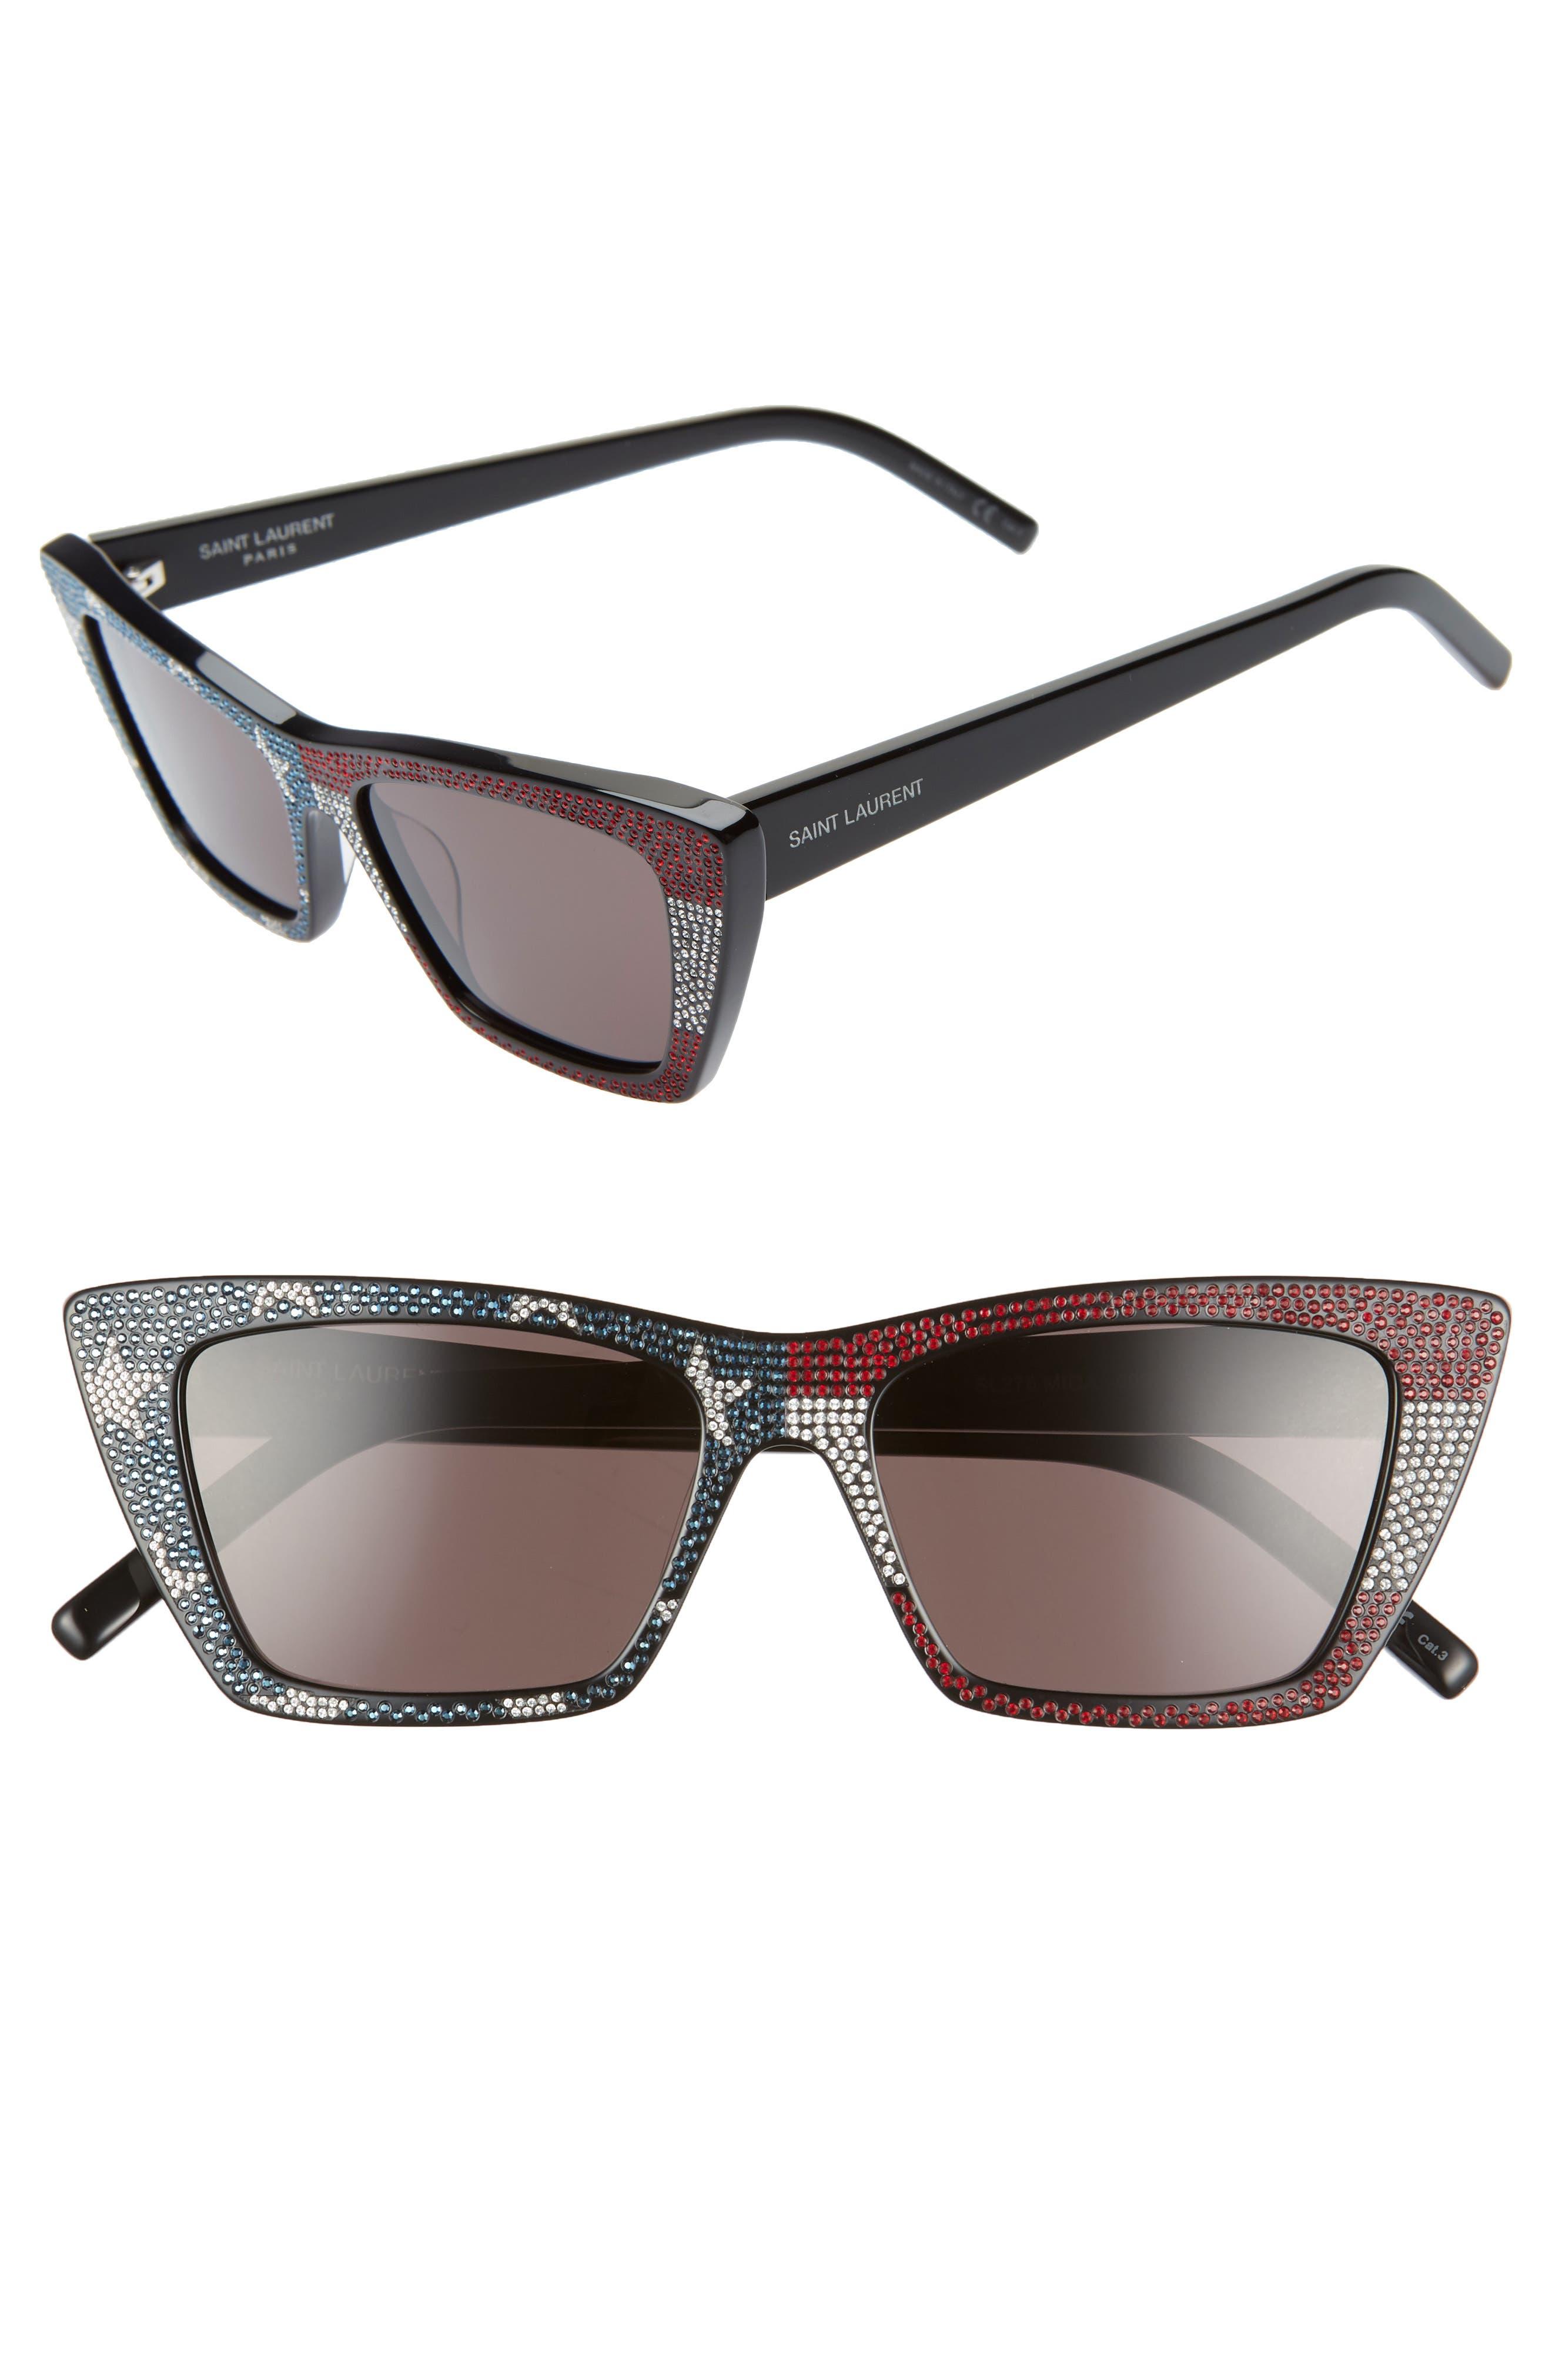 SAINT LAURENT, 53mm Cat Eye Sunglasses, Main thumbnail 1, color, BLACK/ CRYSTAL RED BLUE/ GREY